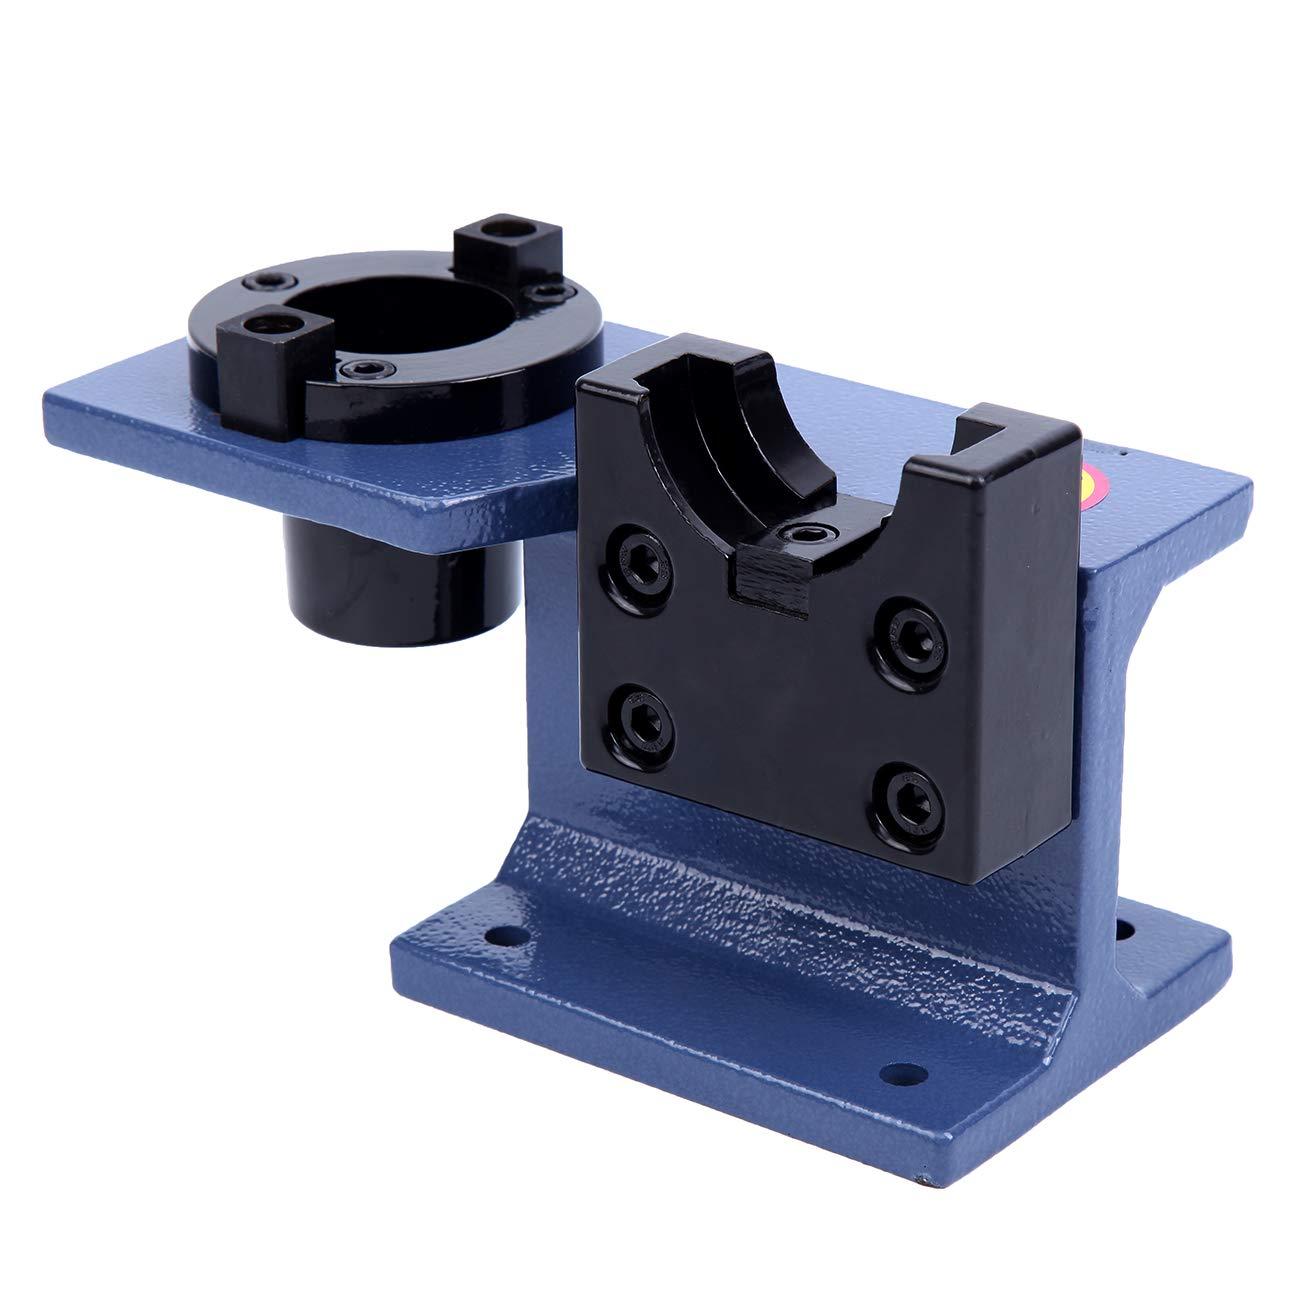 PanelTech Universal CNC CAT 40 Tool Holder Fixture BT 40 Tool Tightening Fixture Clamp